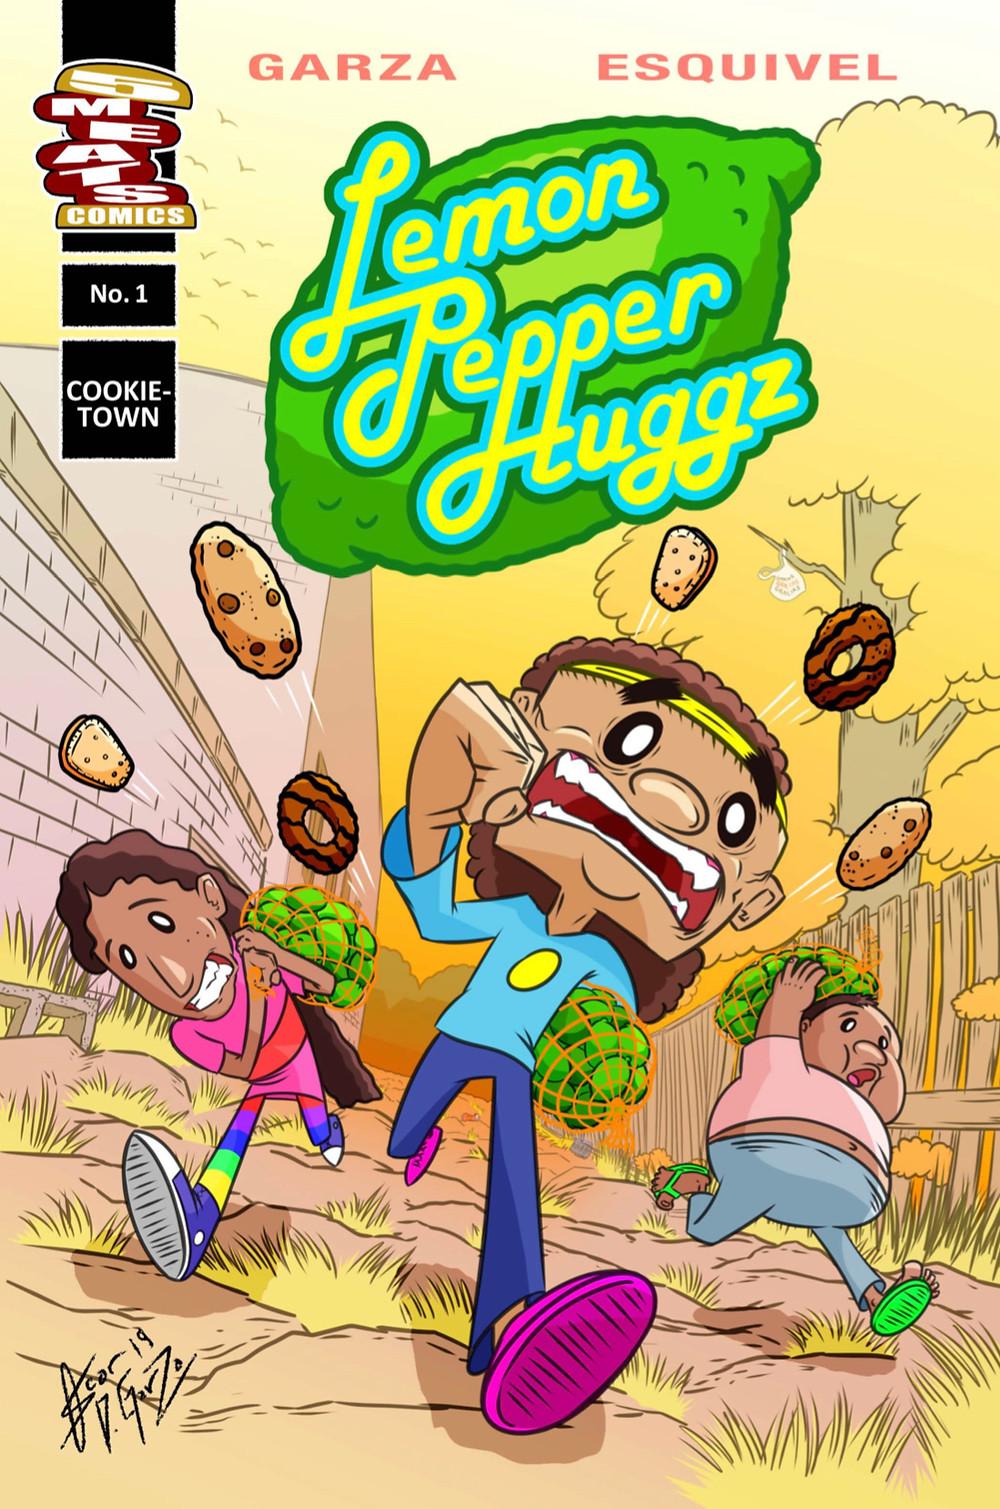 Lemon Pepper Huggz, Issue #1, cover, 5 Meats Comics, Garza/Esquivel